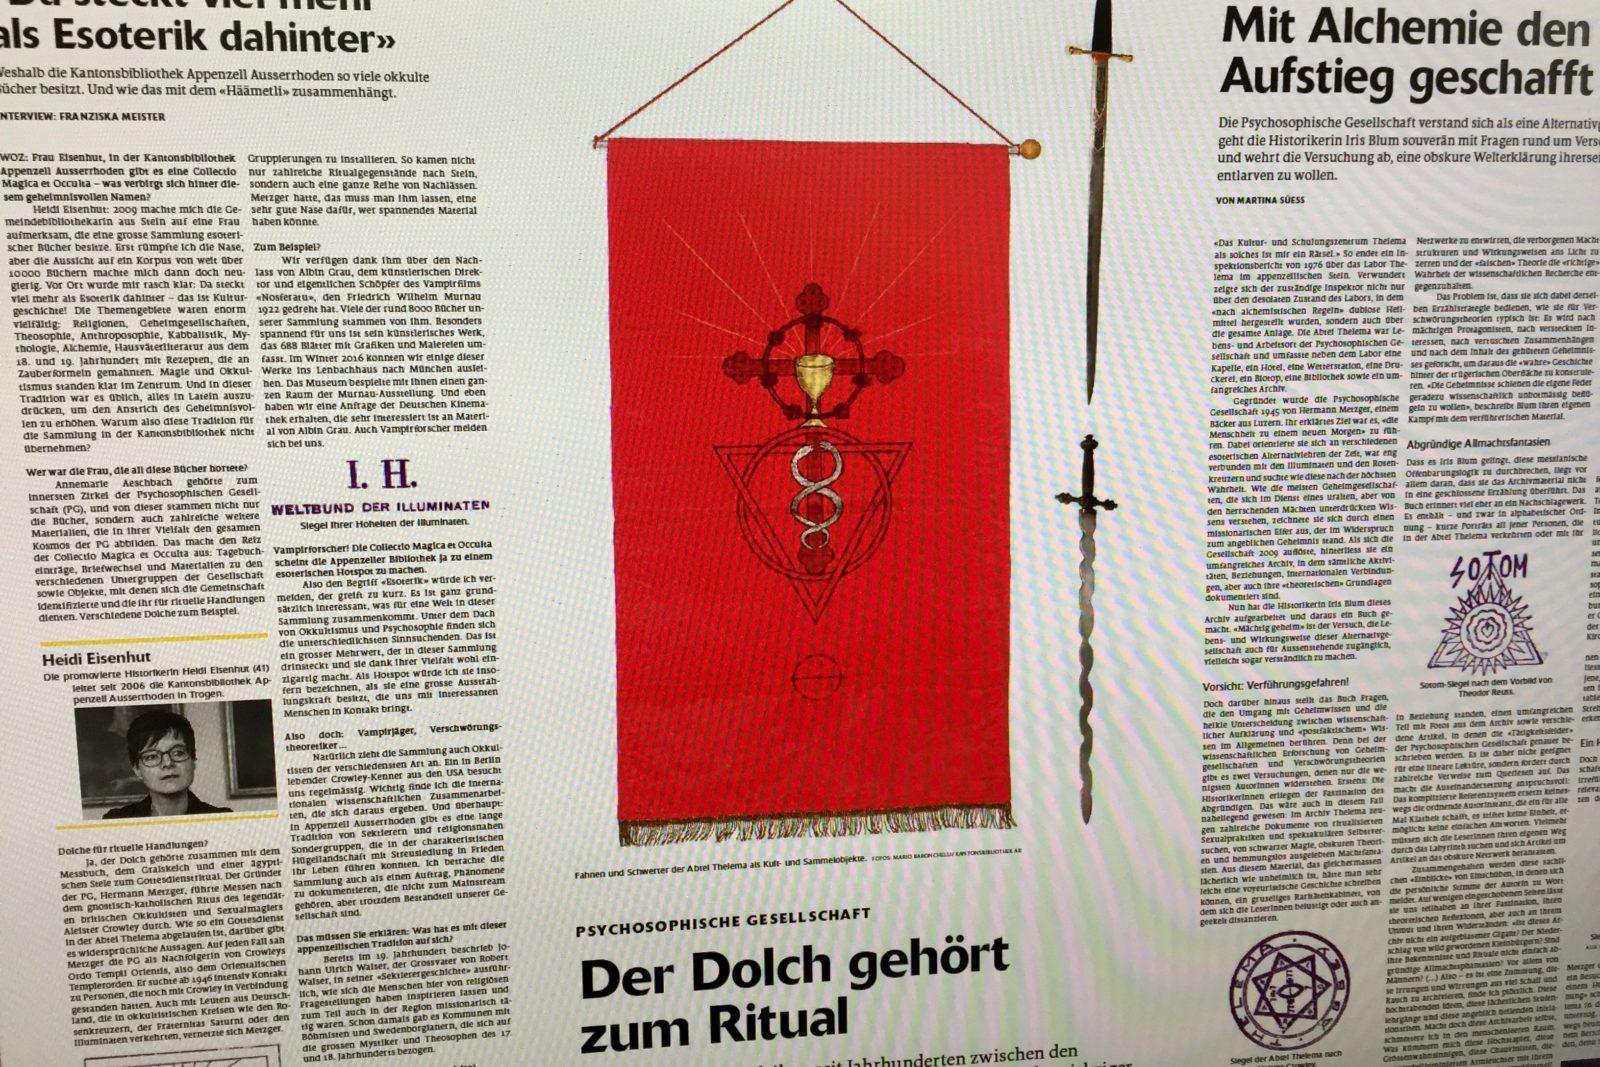 WOZ: collectio magica et occulta